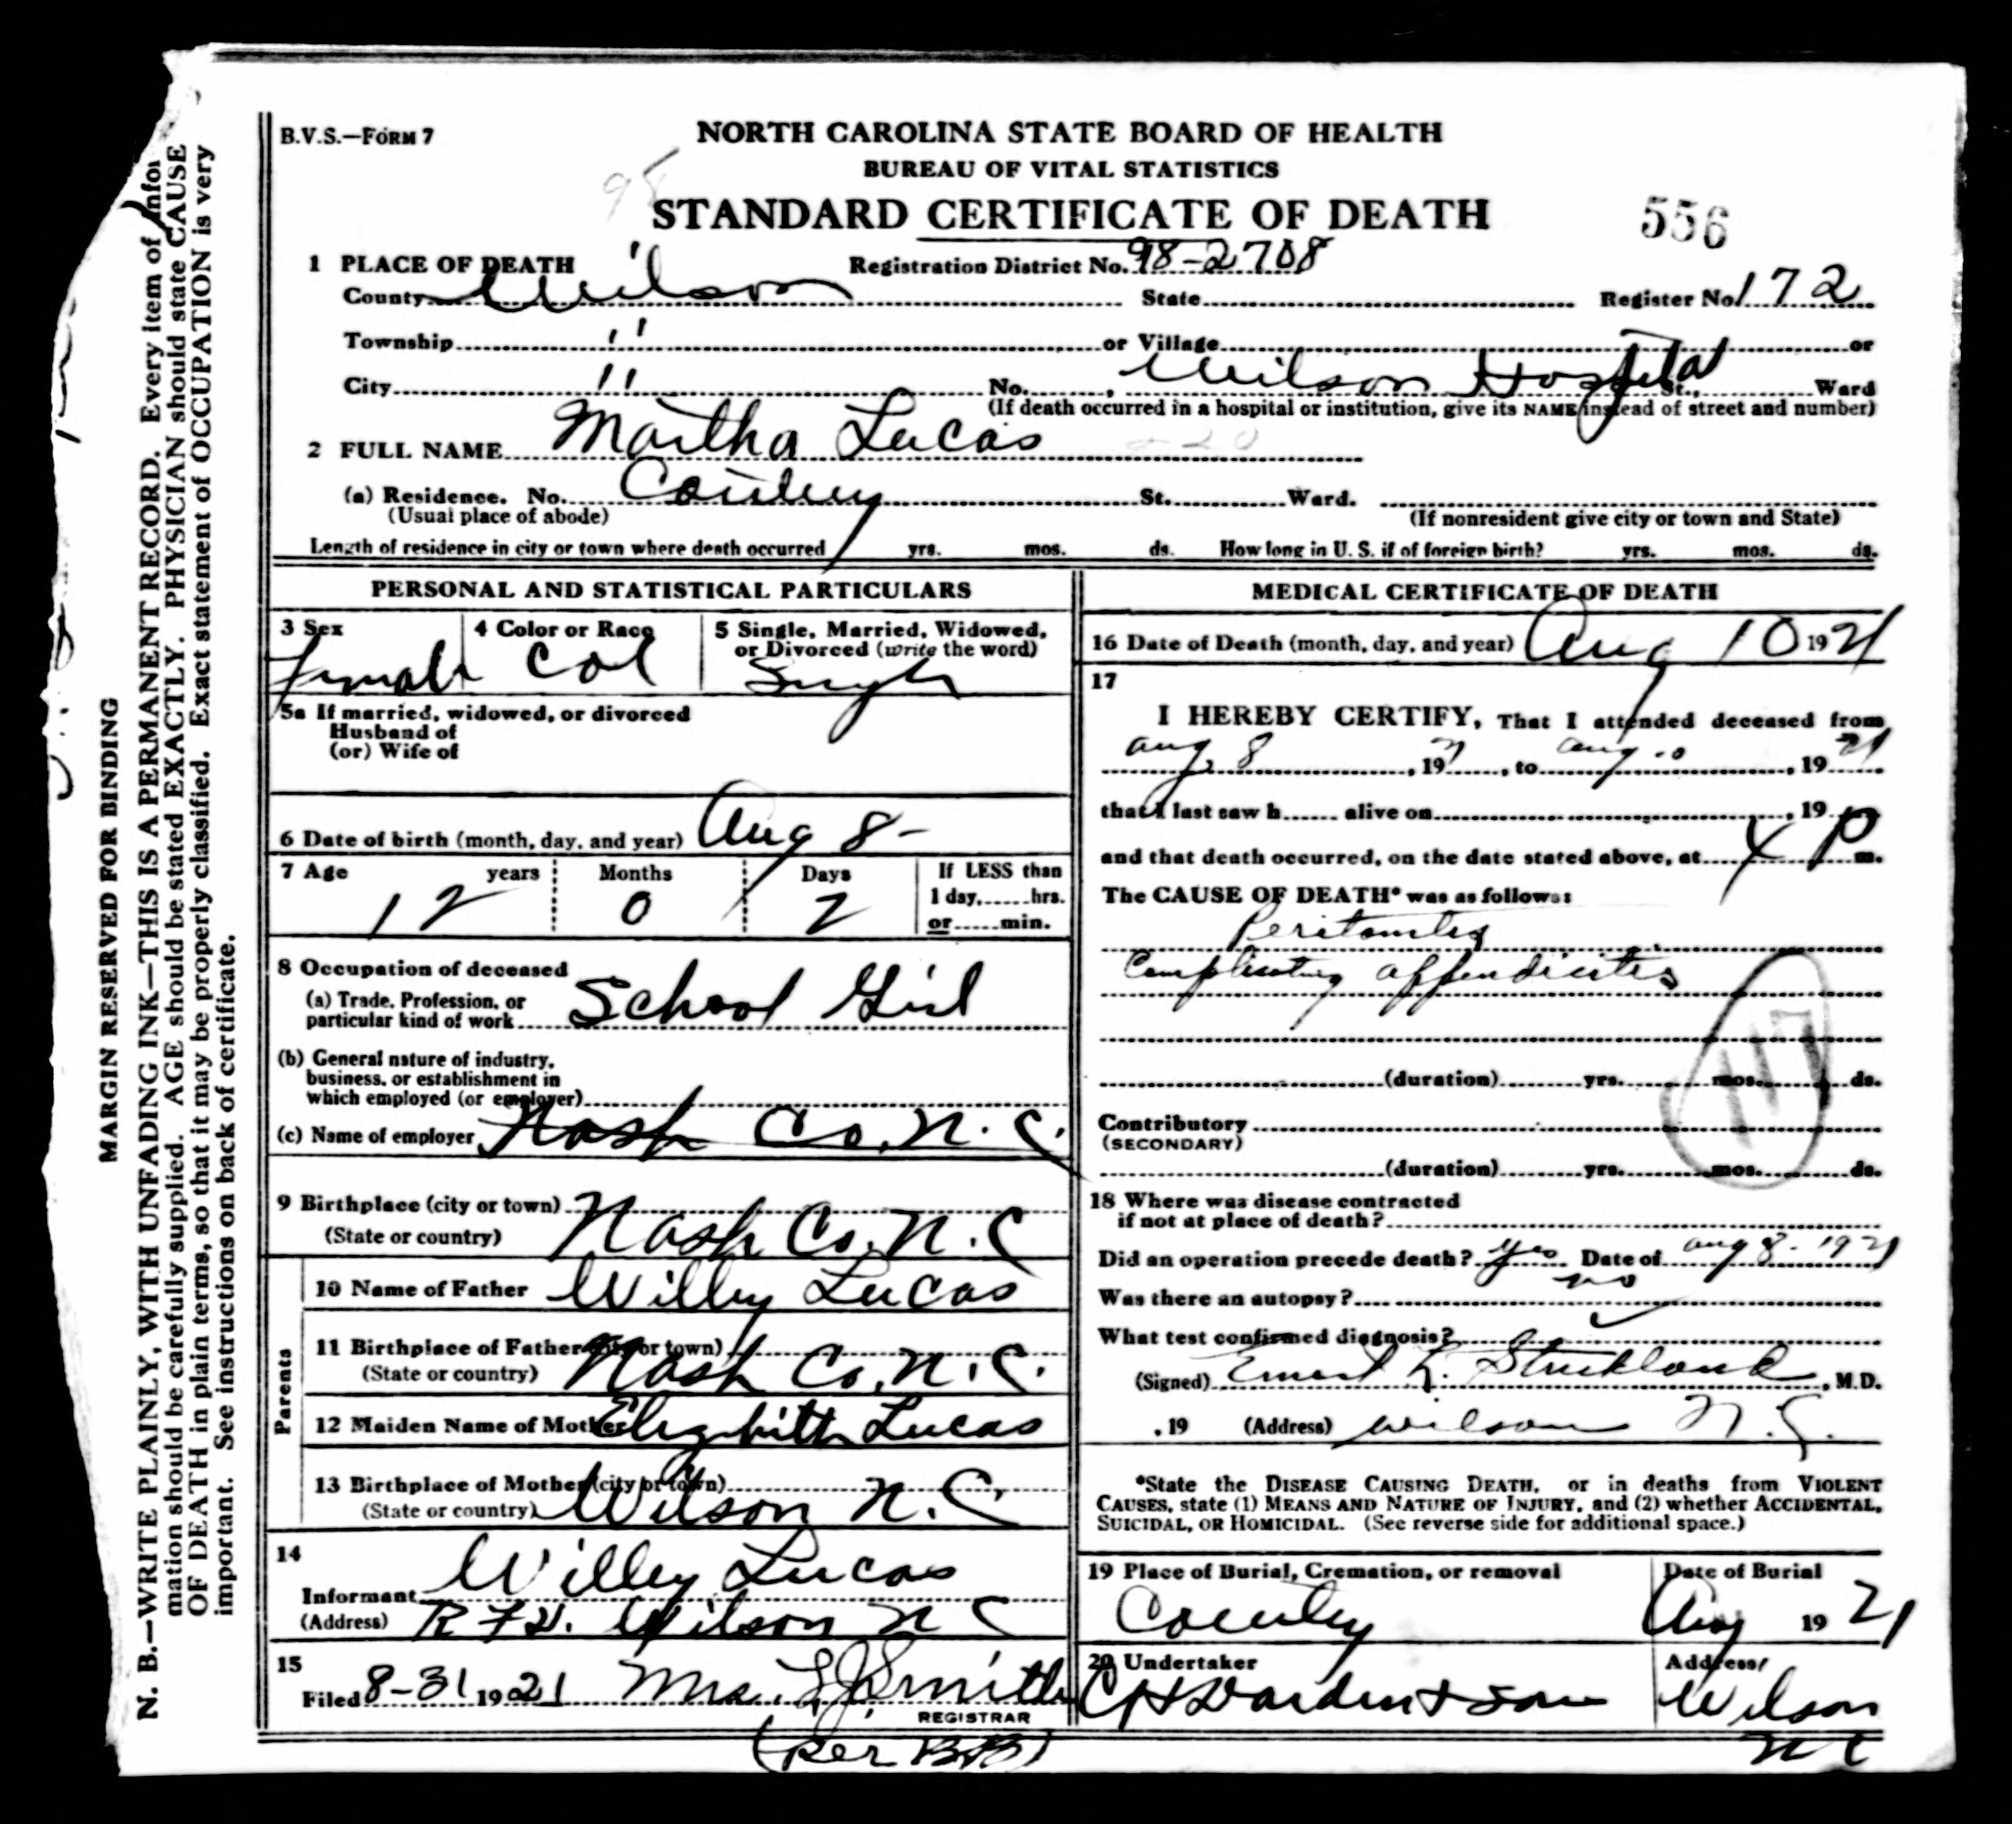 Business scuffalong genealogy page 3 s123124 1585 xflitez Gallery